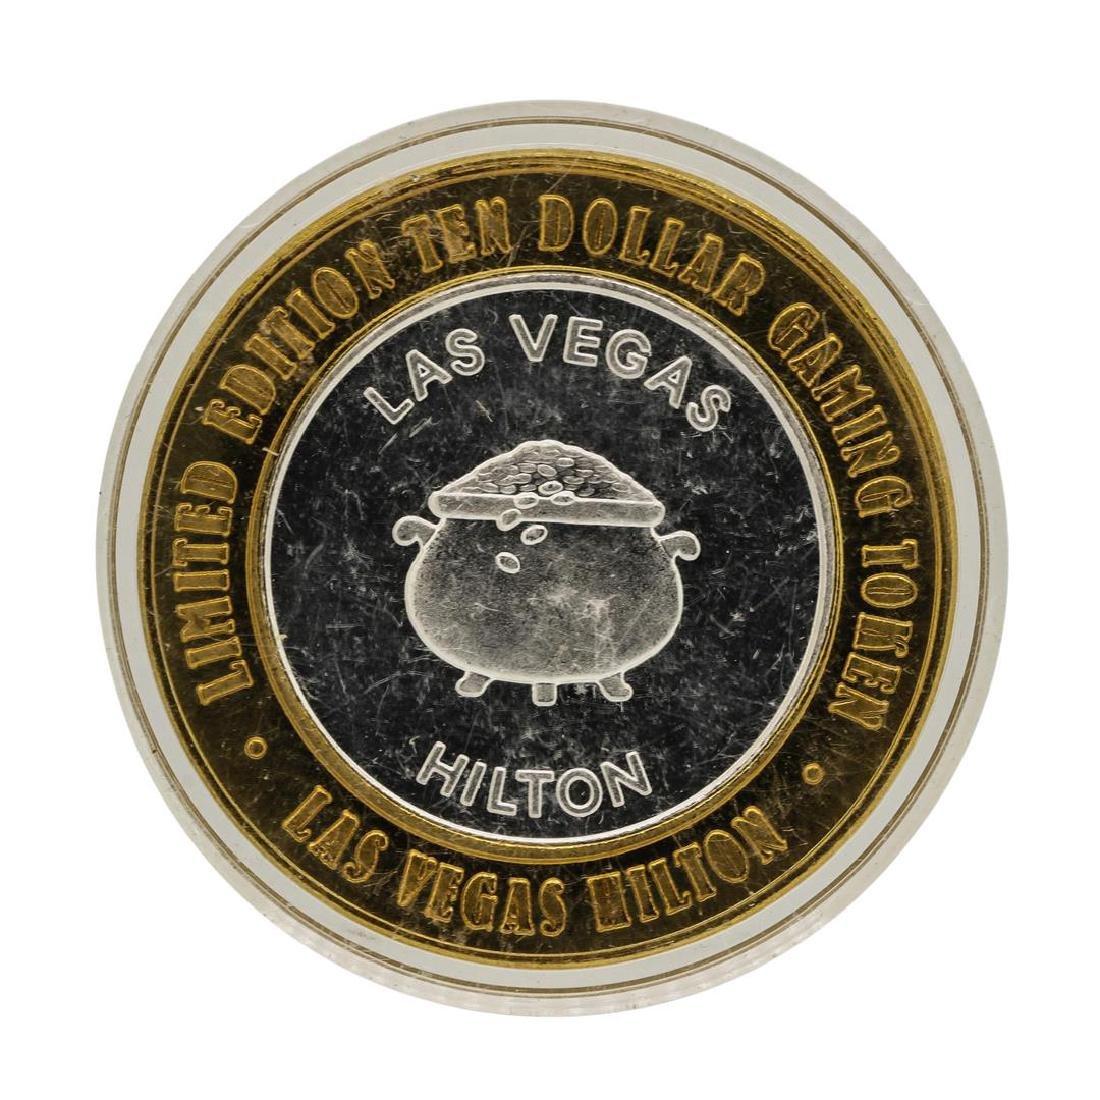 .999 Silver Las Vegas, Nevada Hilton $10 Casino Limited